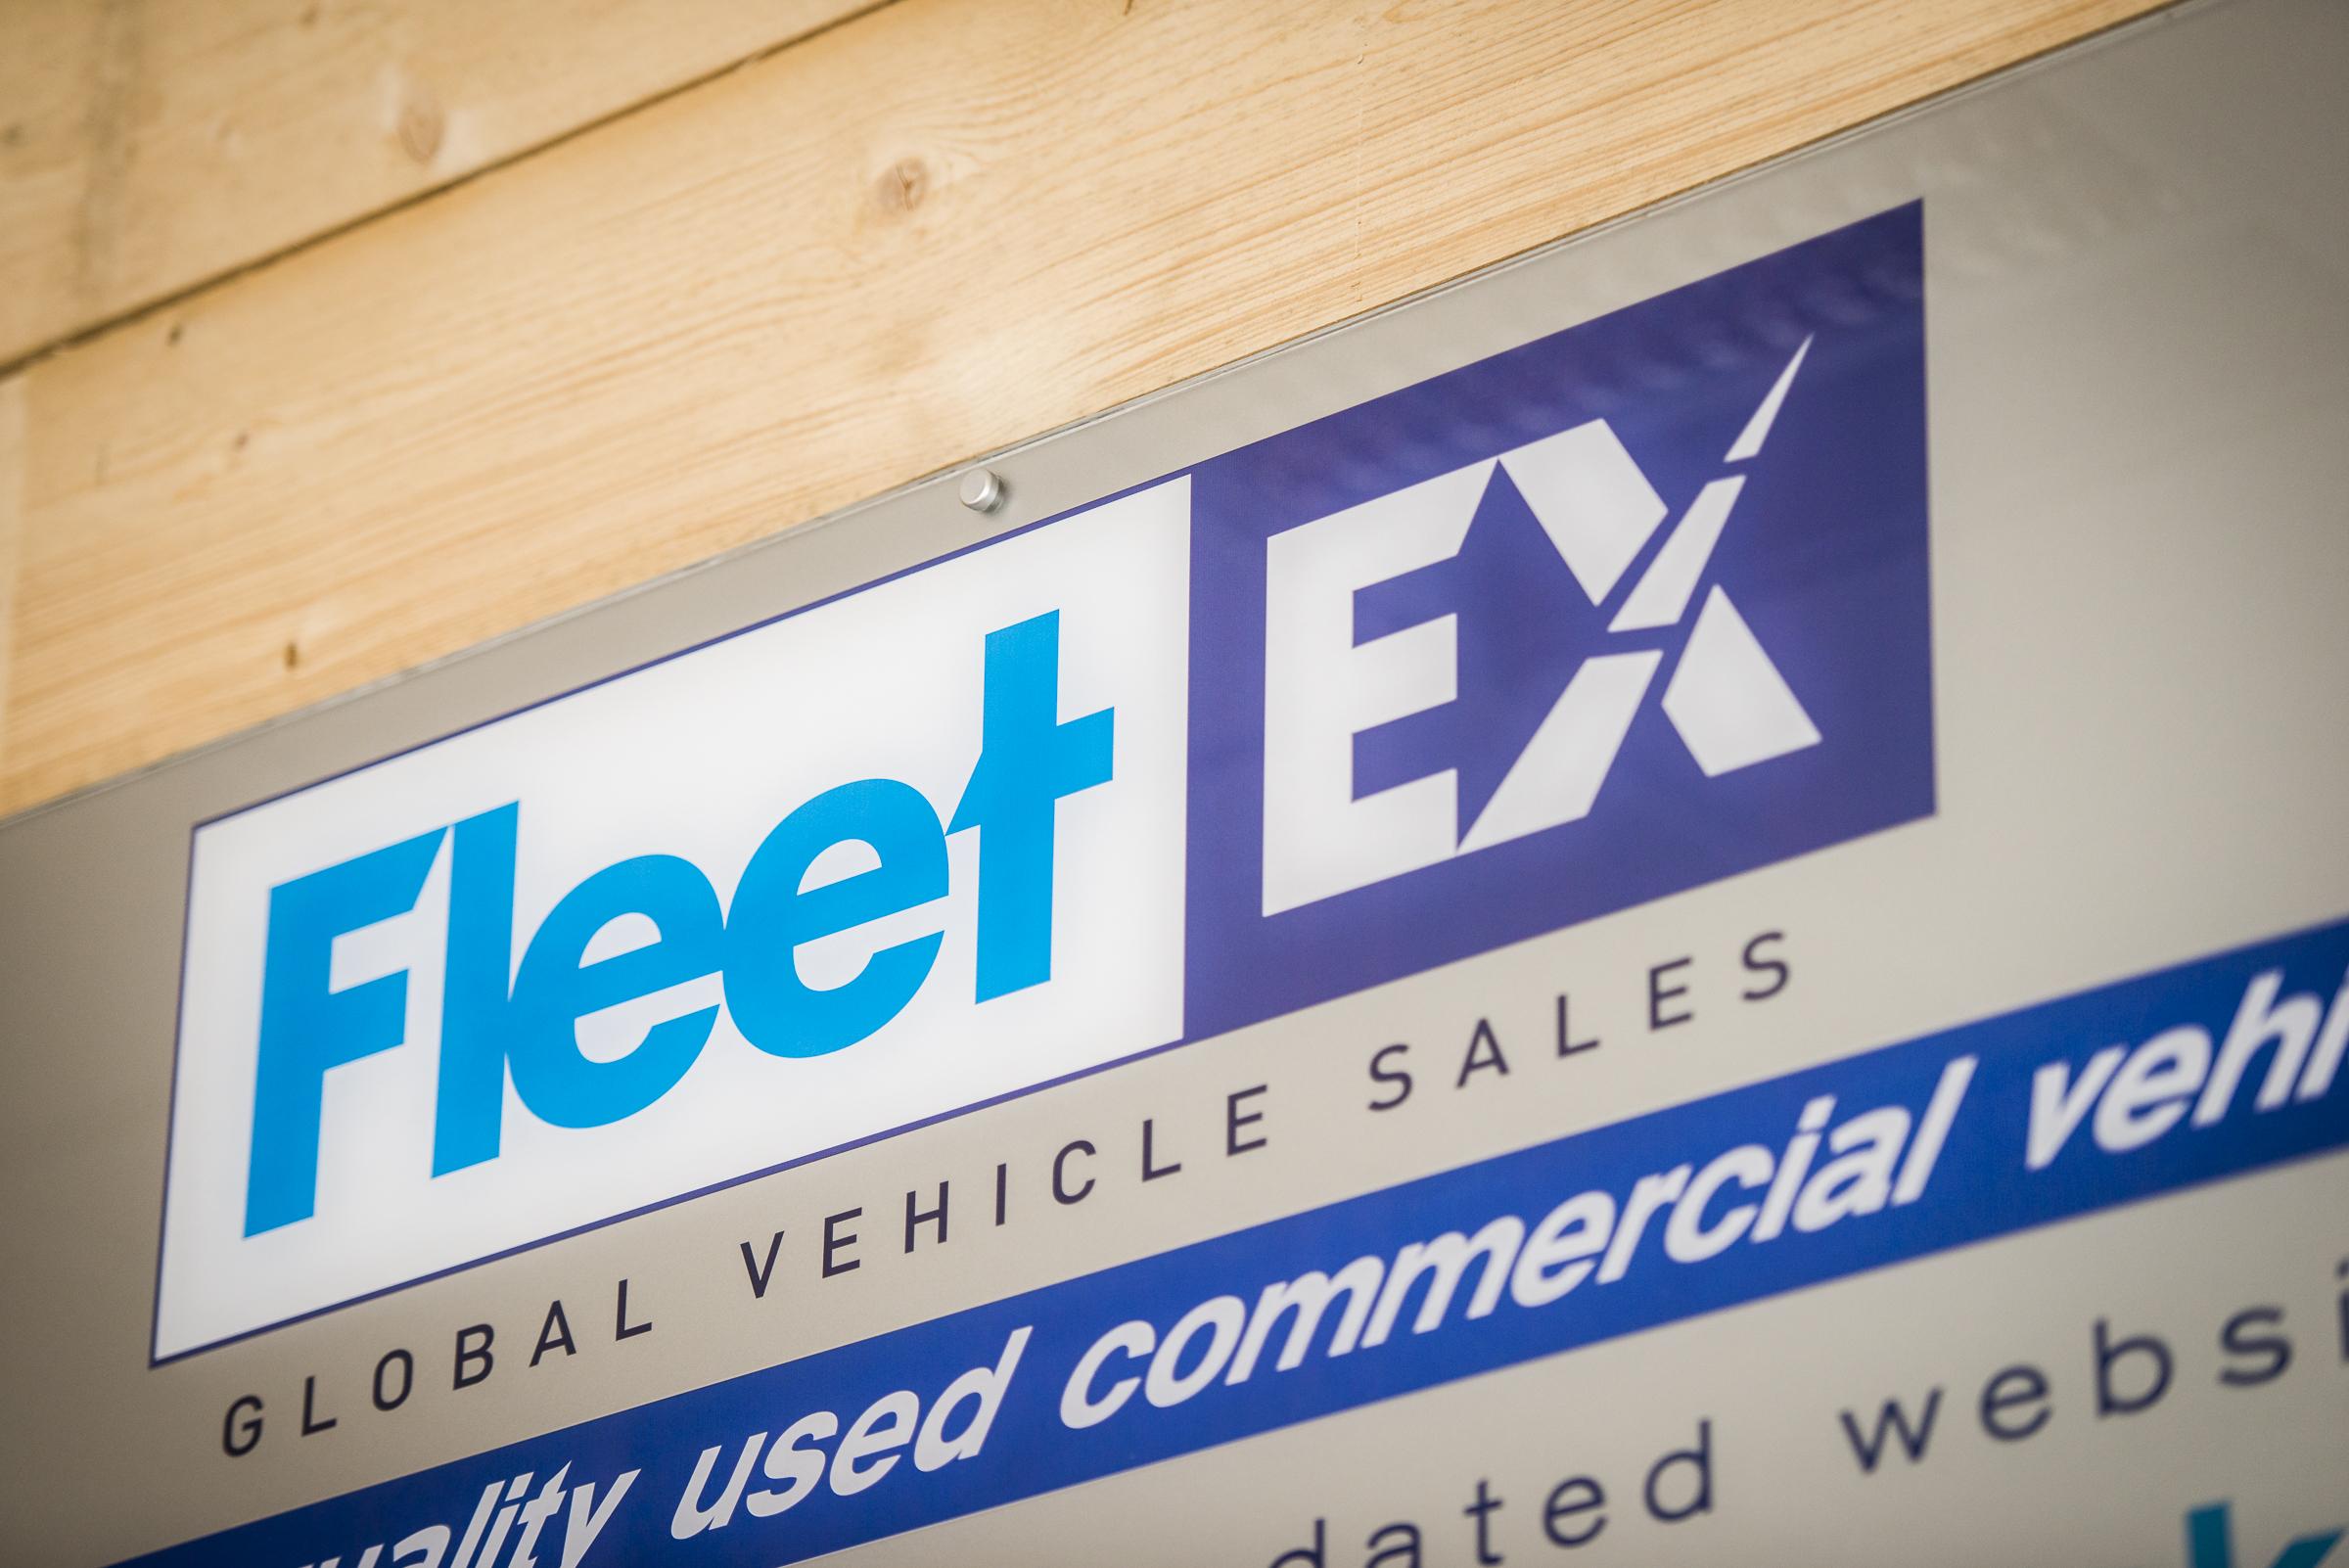 fleetex_290615-1008